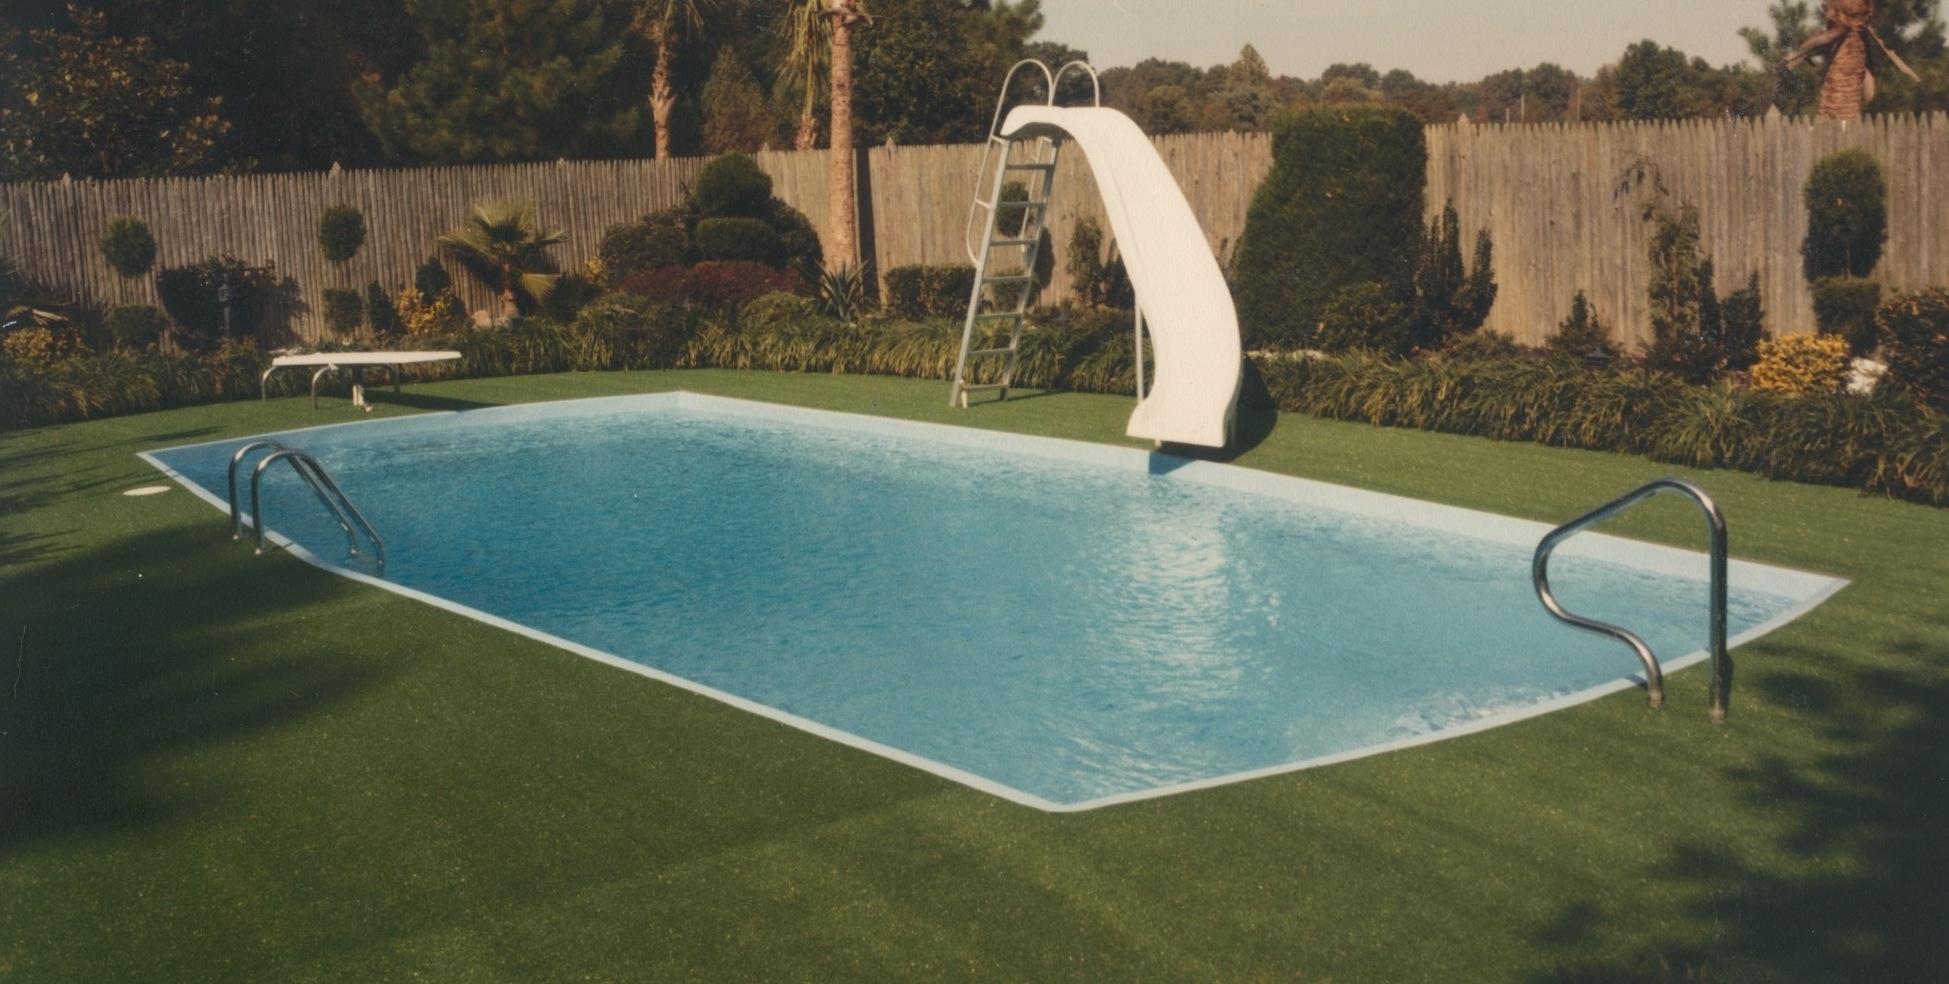 Catalina Poolsmemphis Pool Contractor Memphis